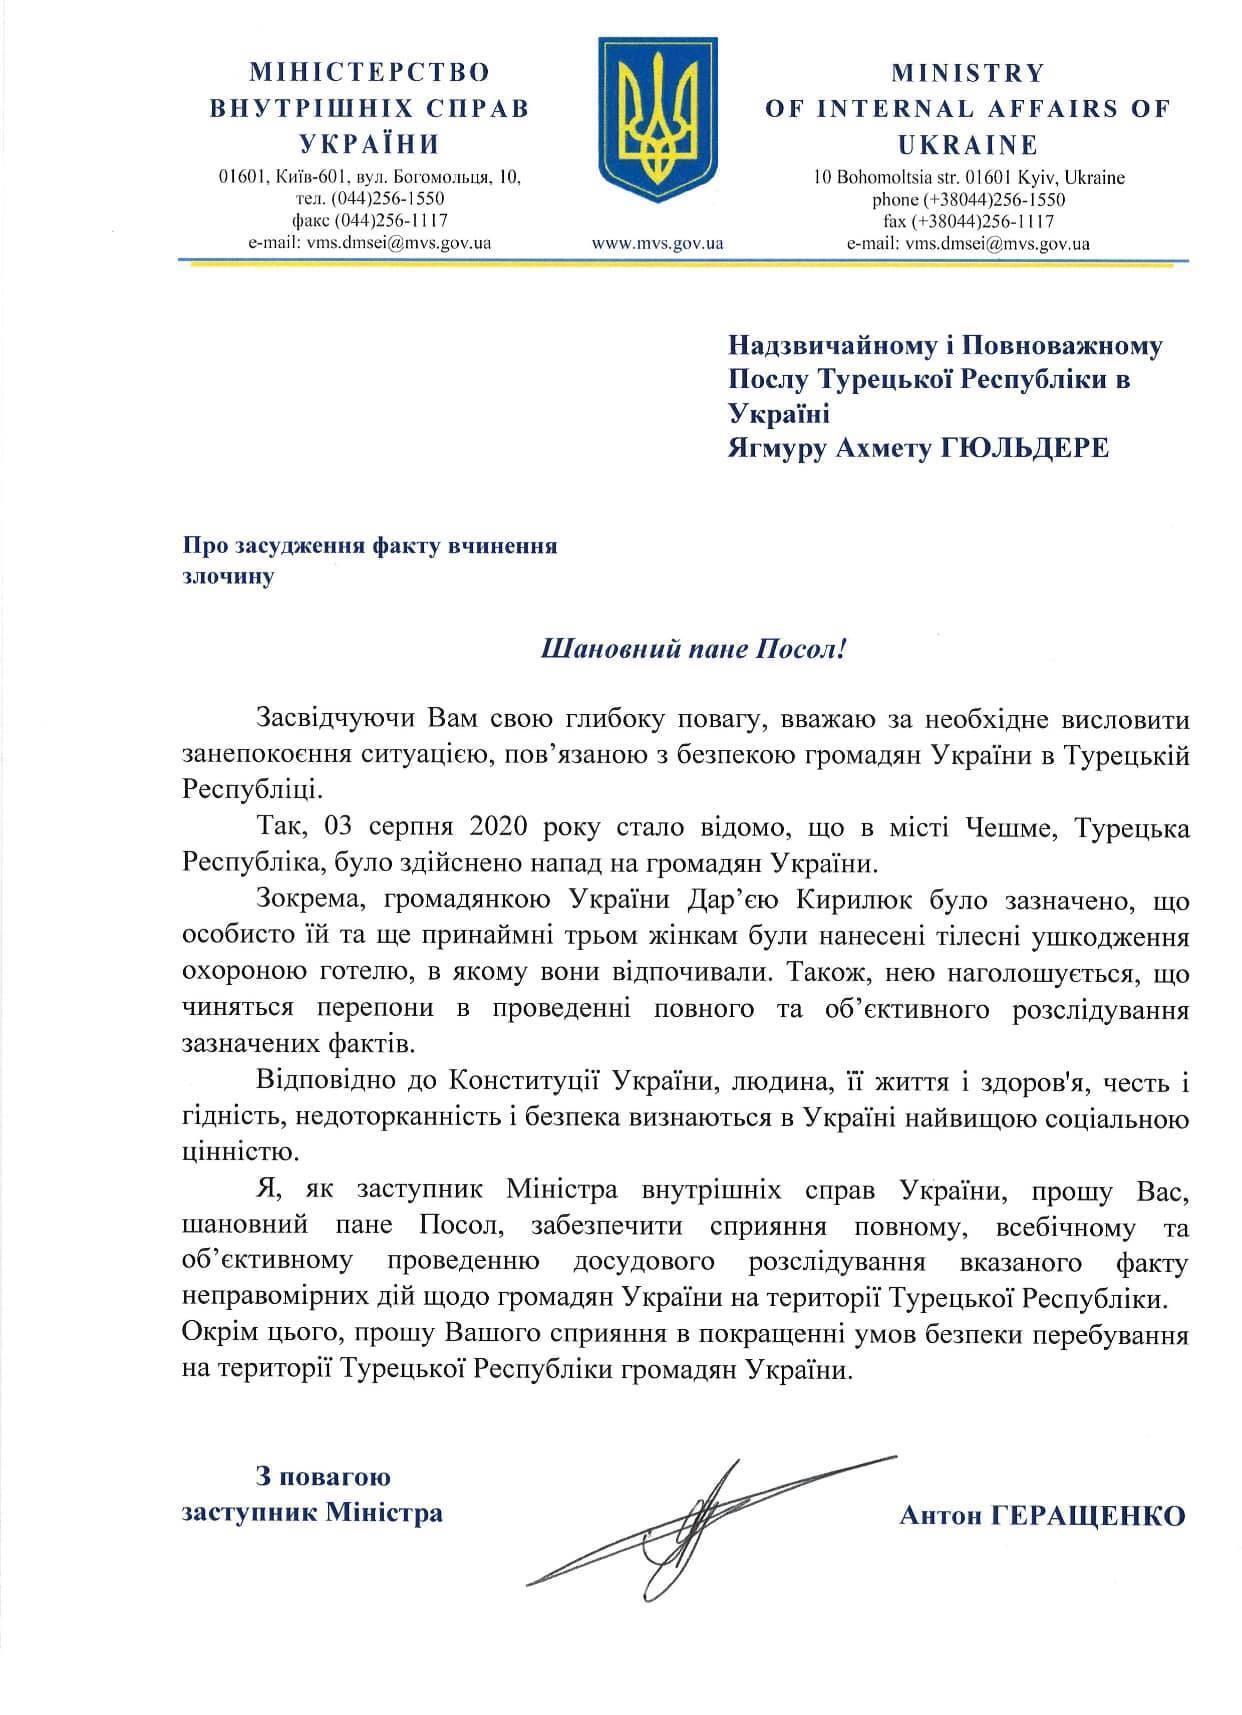 Facebook-аккаунт Антона Геращенко